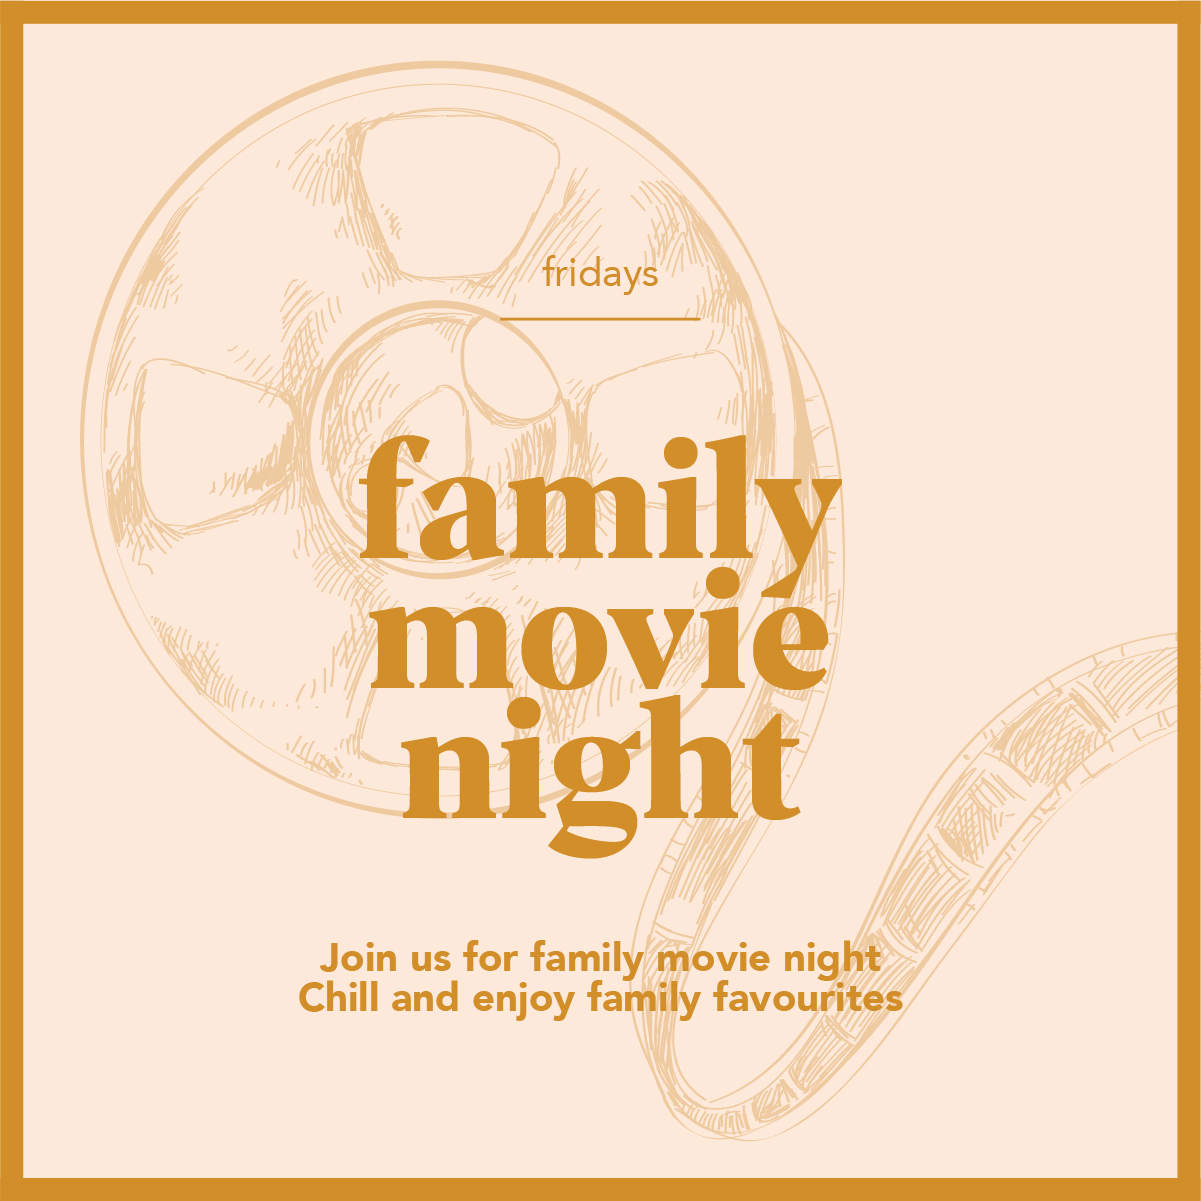 TGR-Family Movie Night-01.jpg